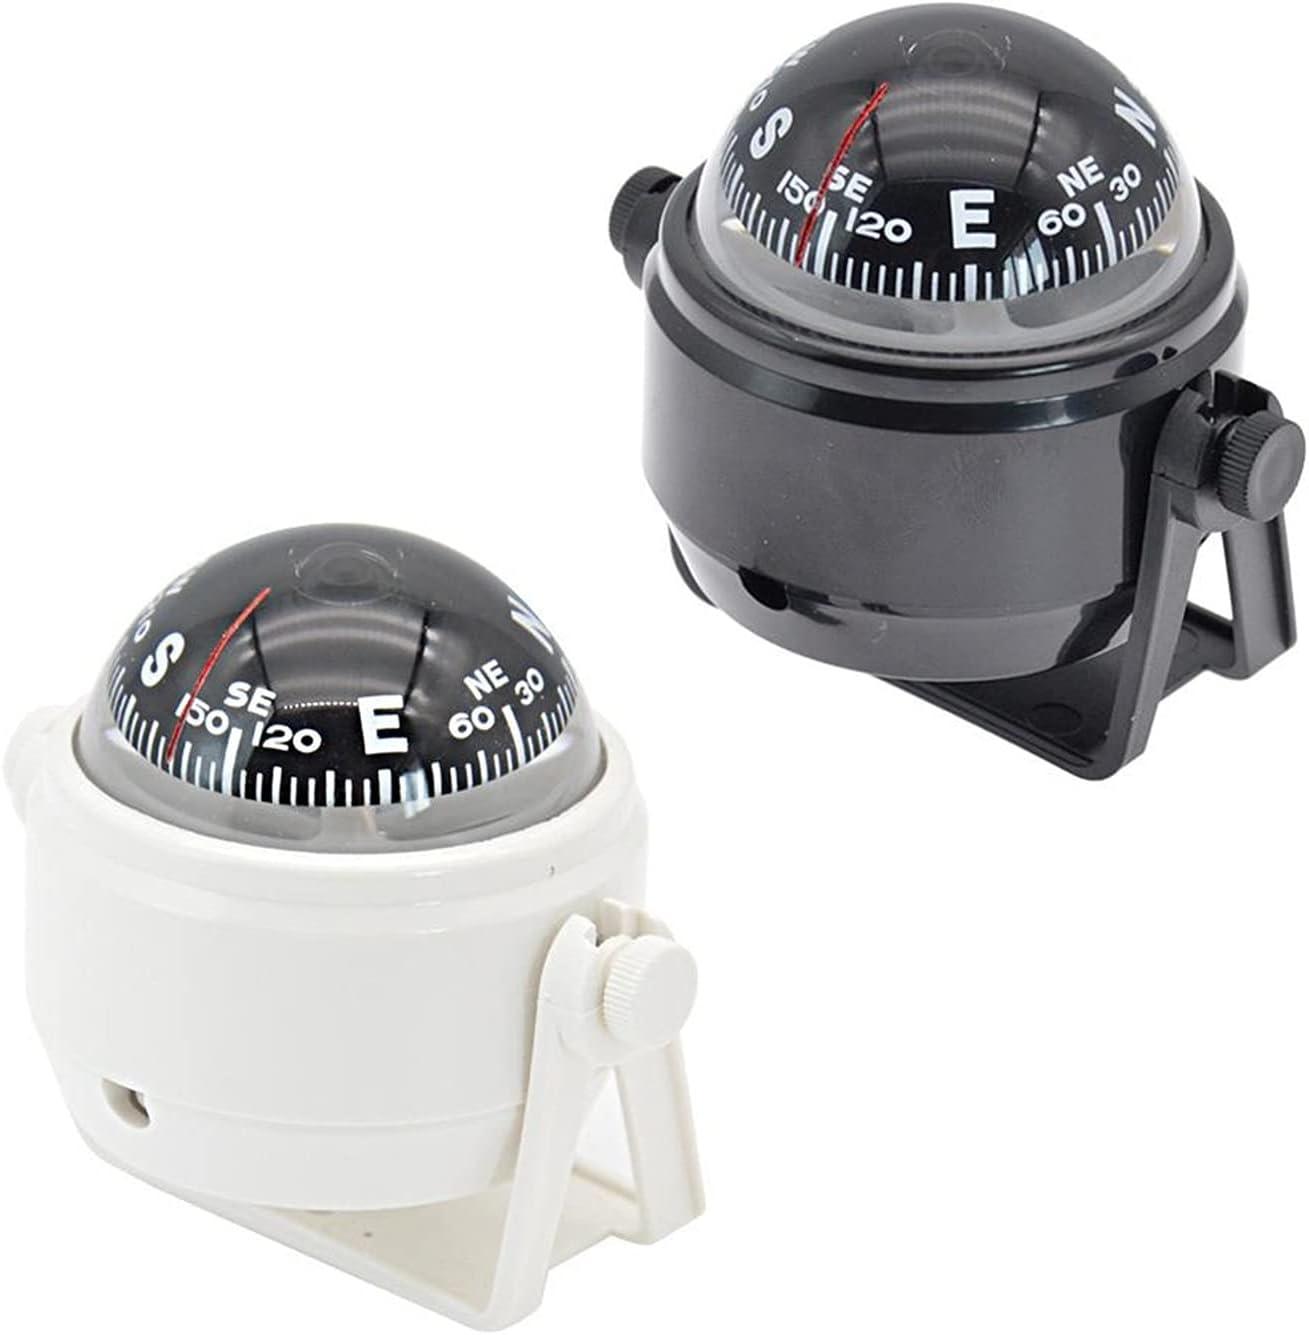 Popular product Yi-Achieve Very popular Sea Marine Electronic Digital Caravan Tr Boat Compass